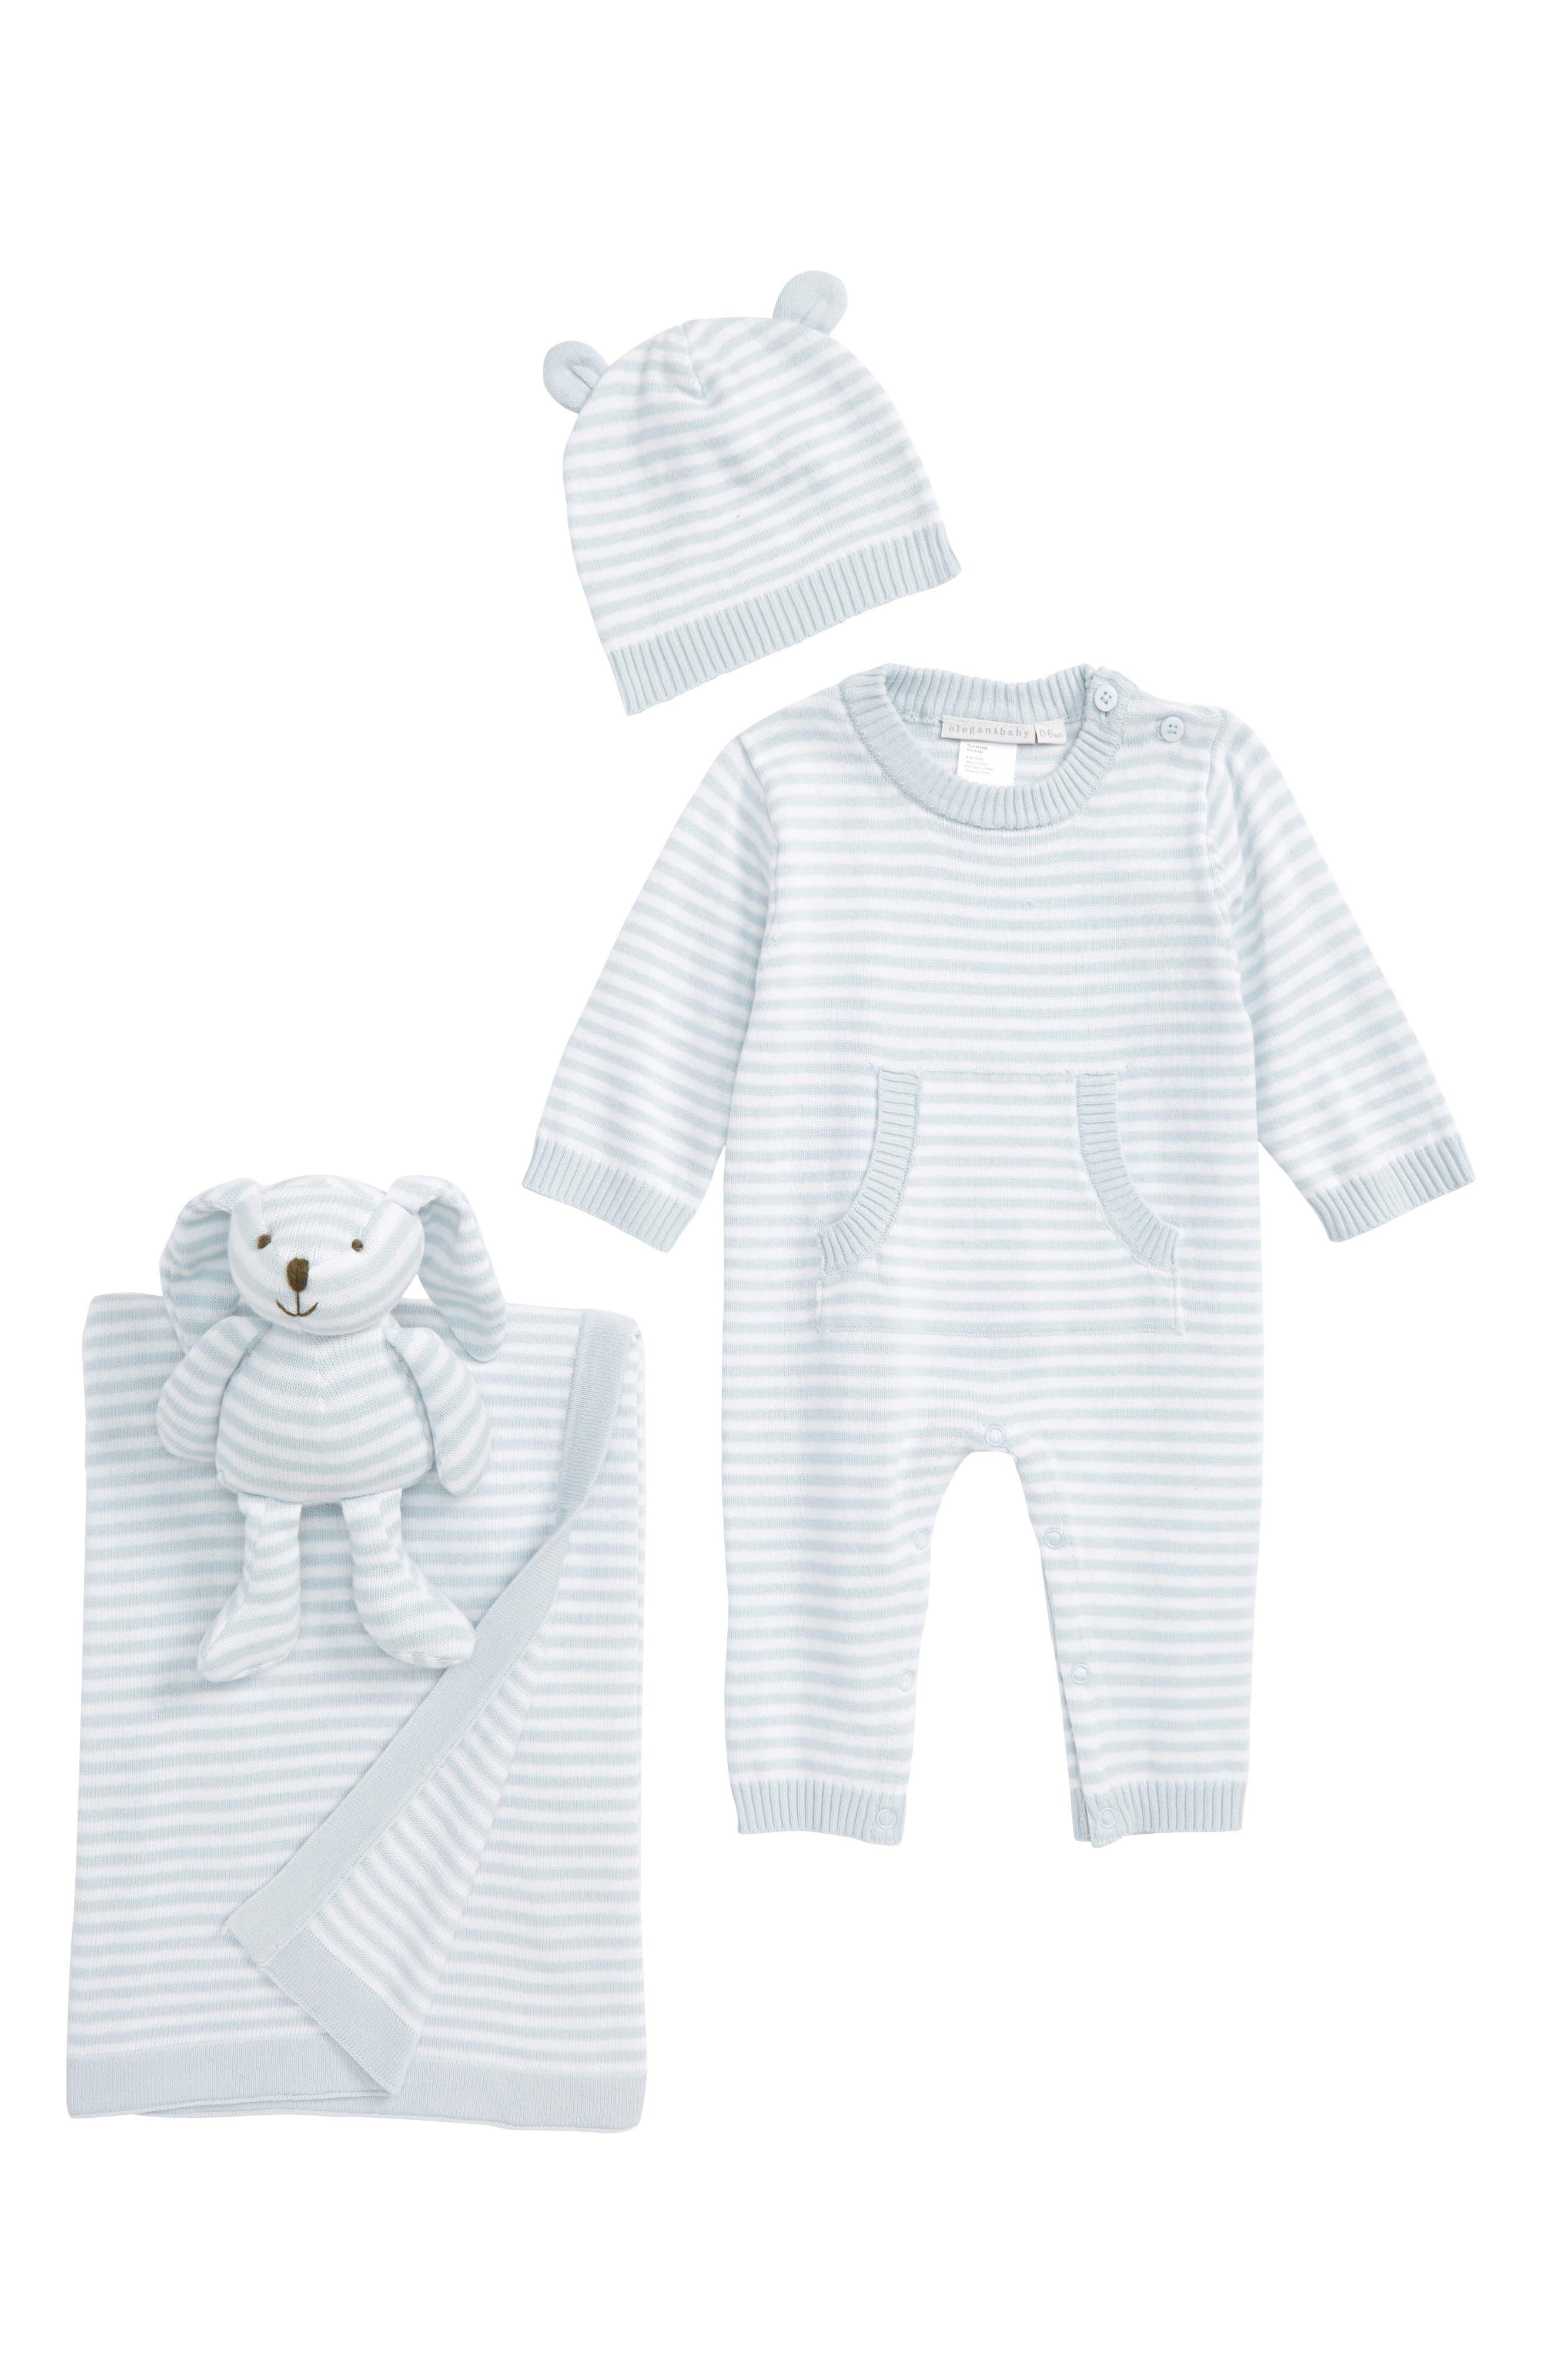 ELEGANT BABY,                             Bunny Romper, Hat, Blanket & Plush Bunny,                             Main thumbnail 1, color,                             450